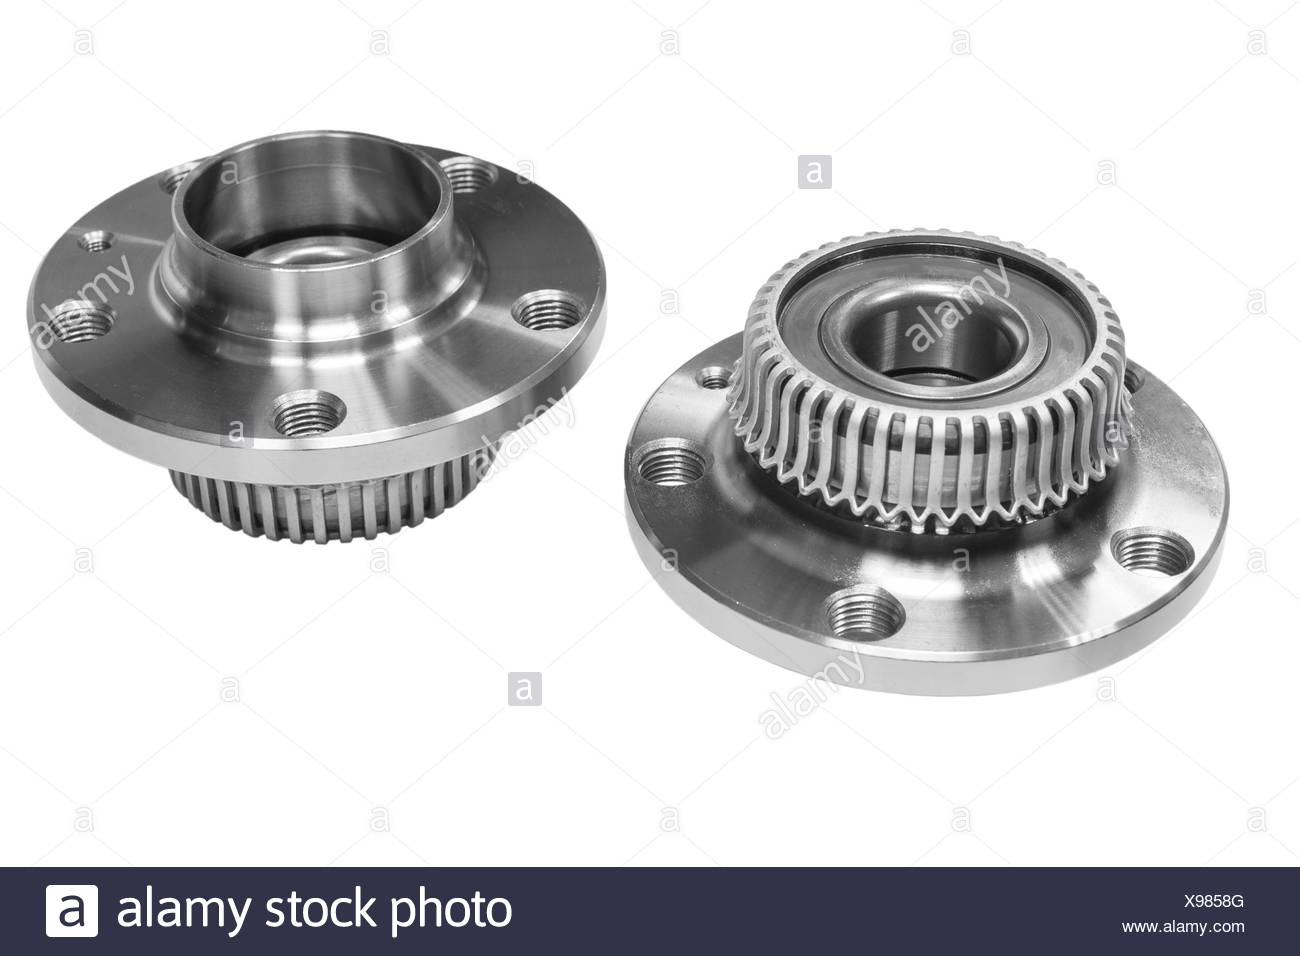 Hub bearing wheel of a car - Stock Image